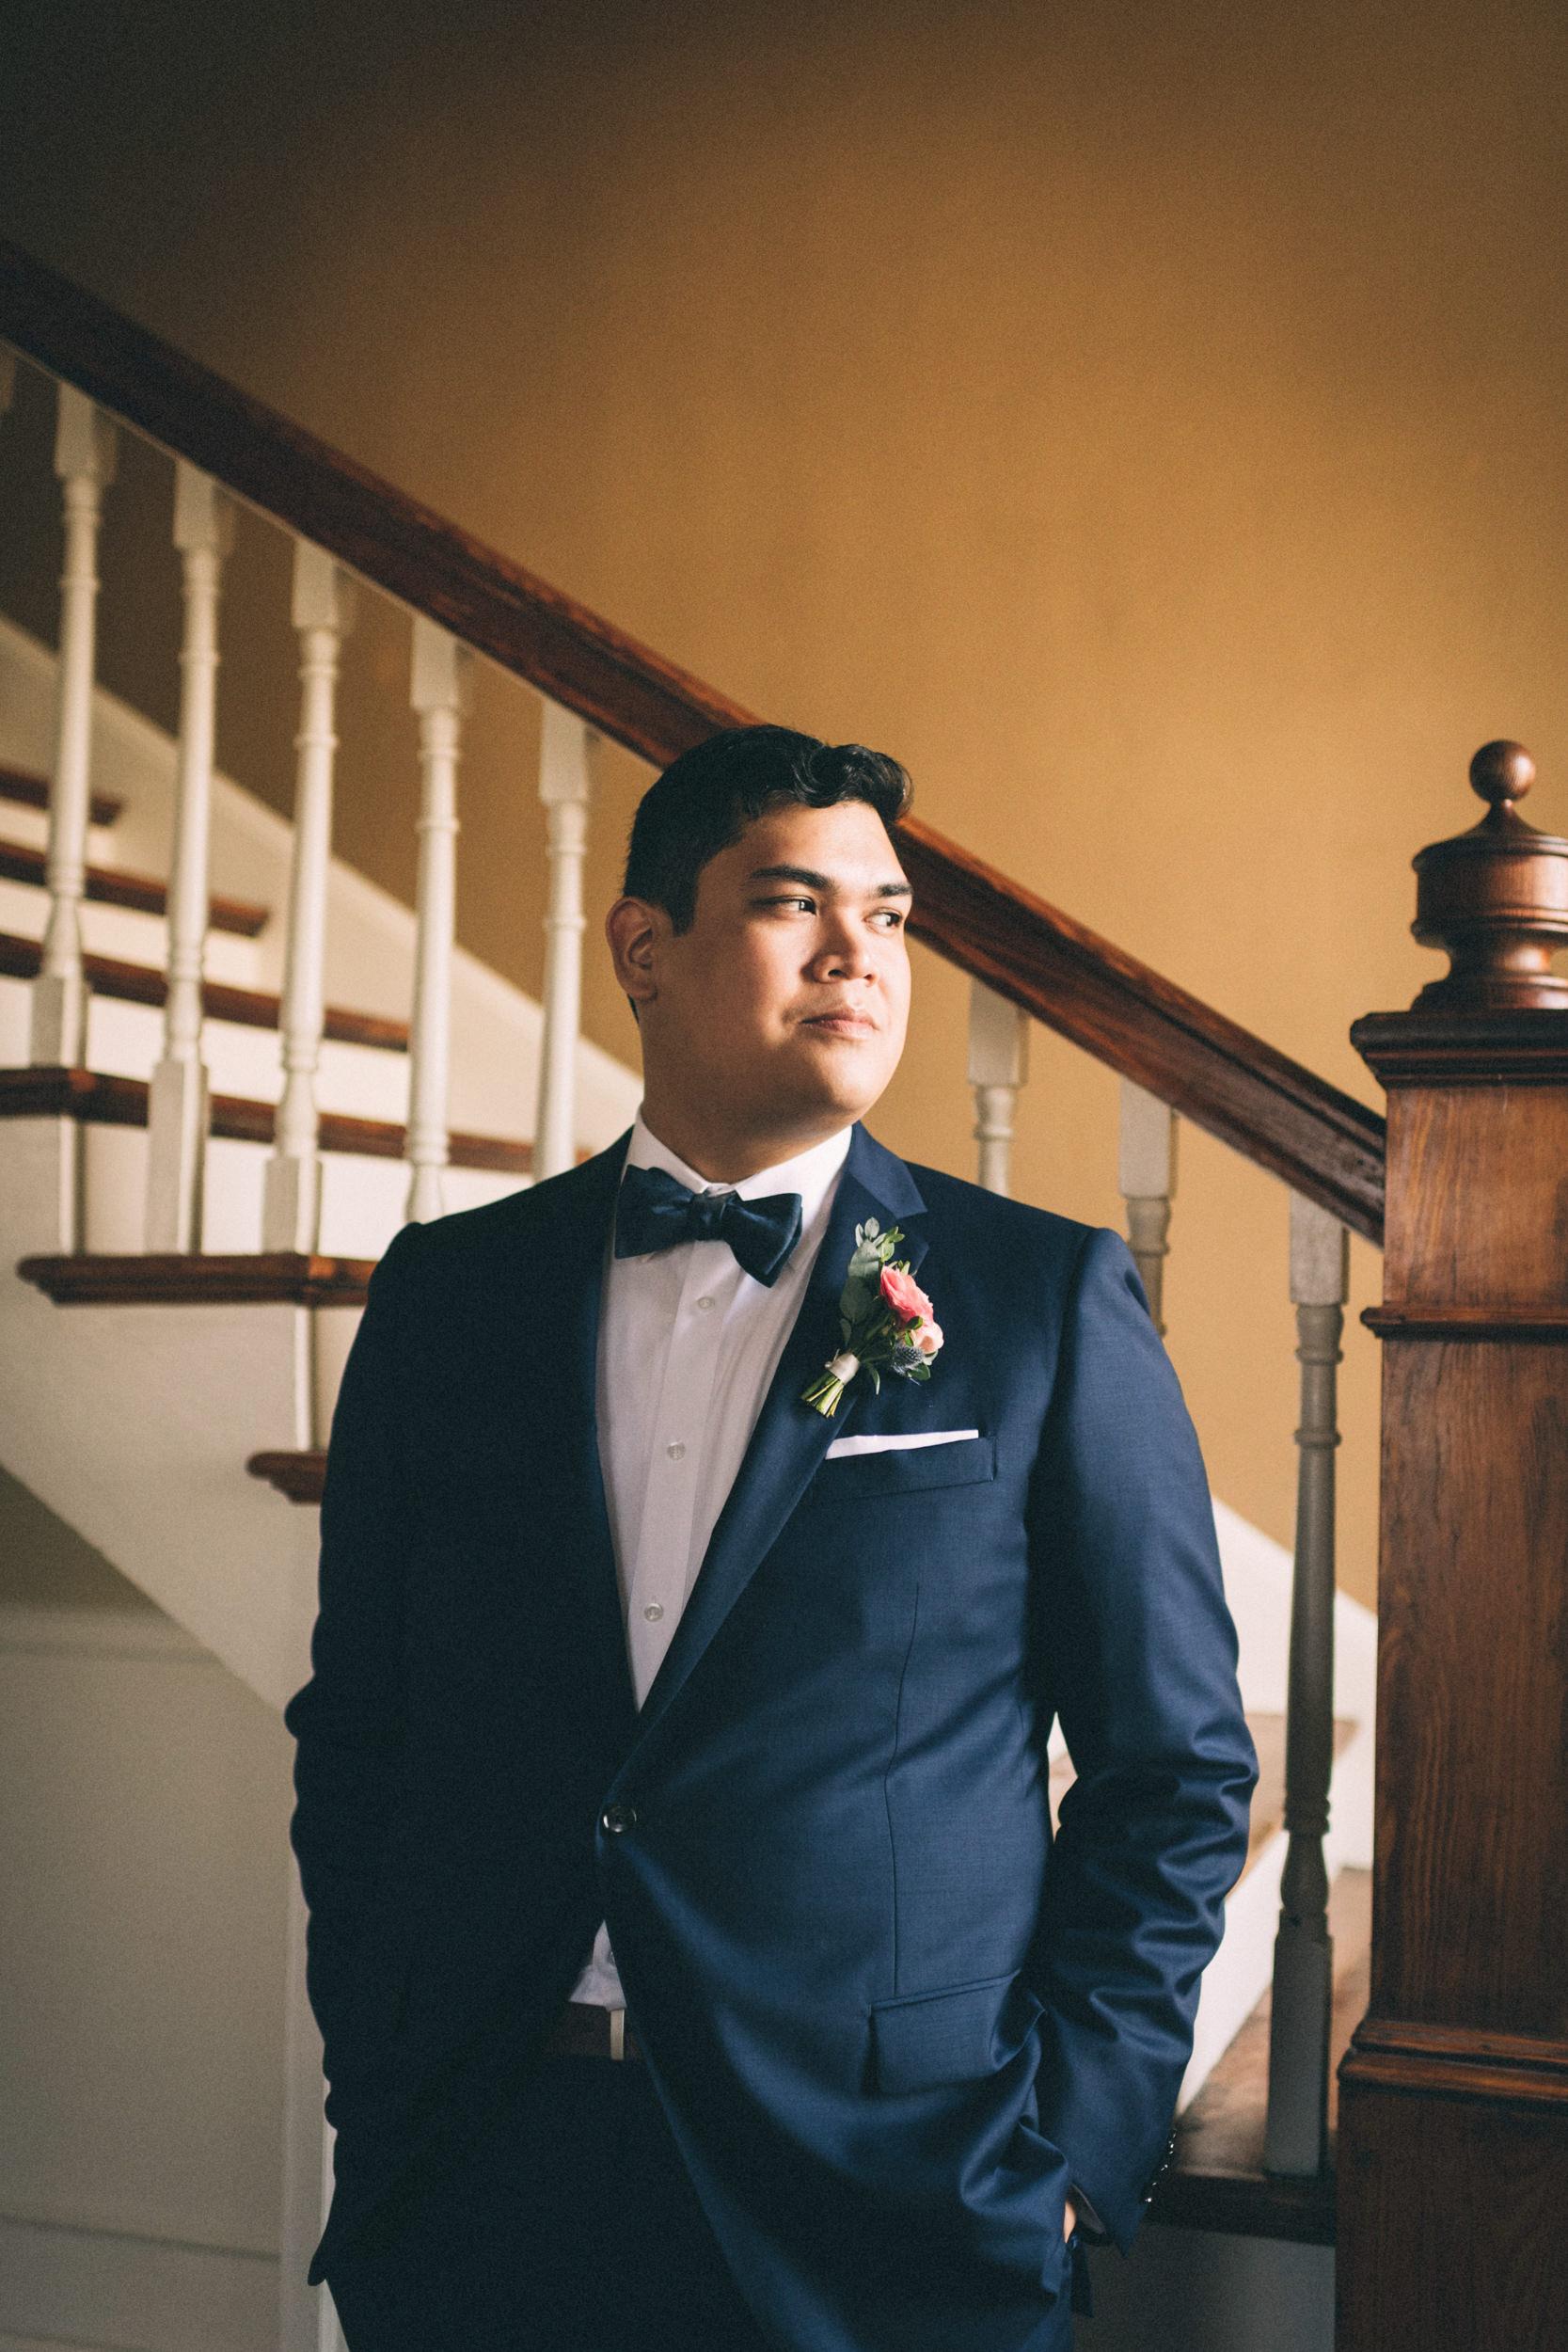 lauren-dean-wedding-grand-lodge-kentucky-sarah-katherine-davis-photography-108edit.jpg